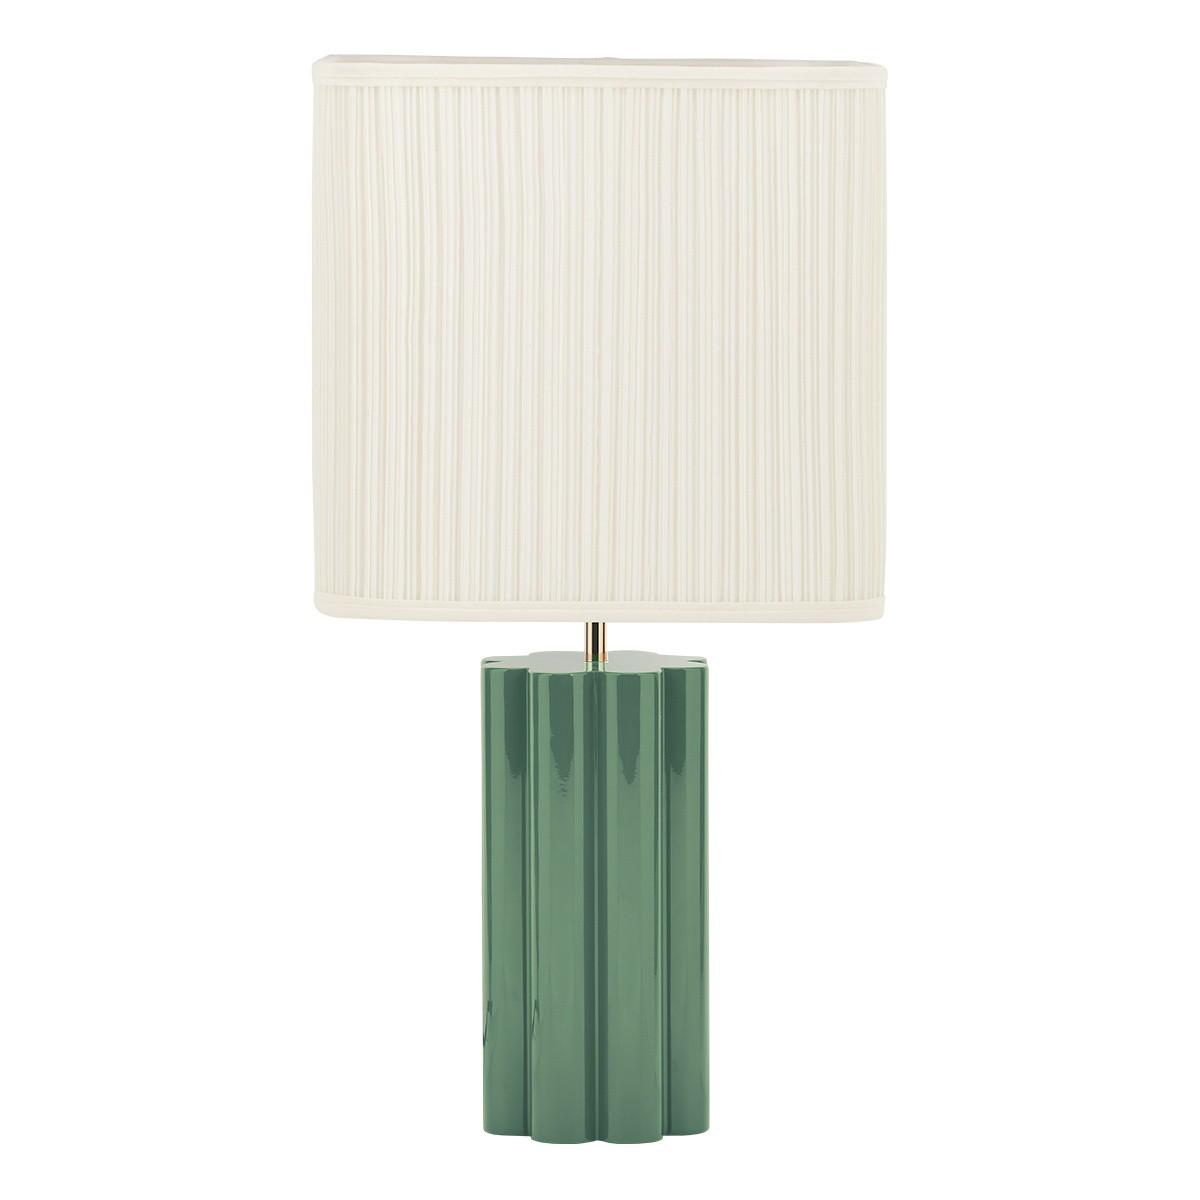 Gioia Table Lamp, Almond Green